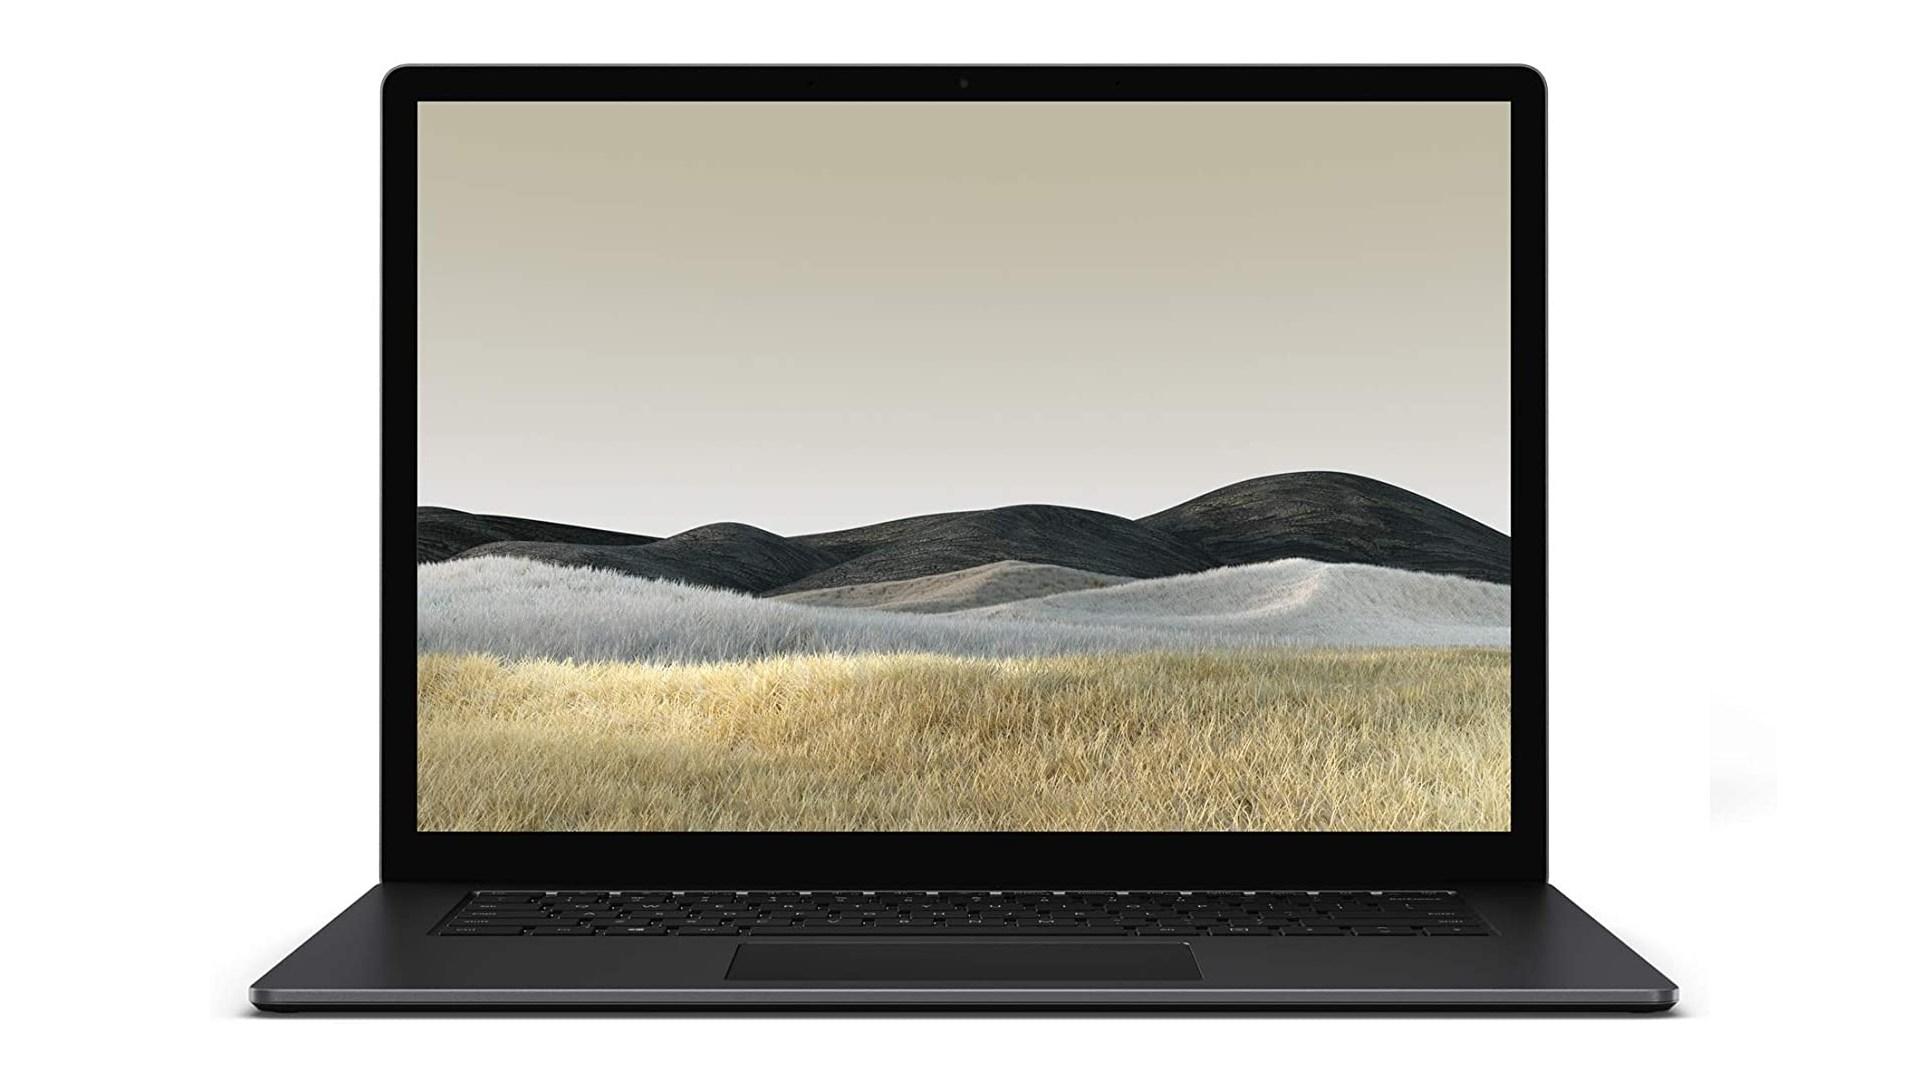 Microsoft, Notebook, Laptop, Surface, Microsoft Surface, Launch, Amd, Preis, Verfügbarkeit, Termin, Ryzen, Surface Laptop, Surface Laptop 4, Surface Edition, Microsoft Surface Laptop 4, Surface Laptop 4 13.5, Surface Laptop 4 15